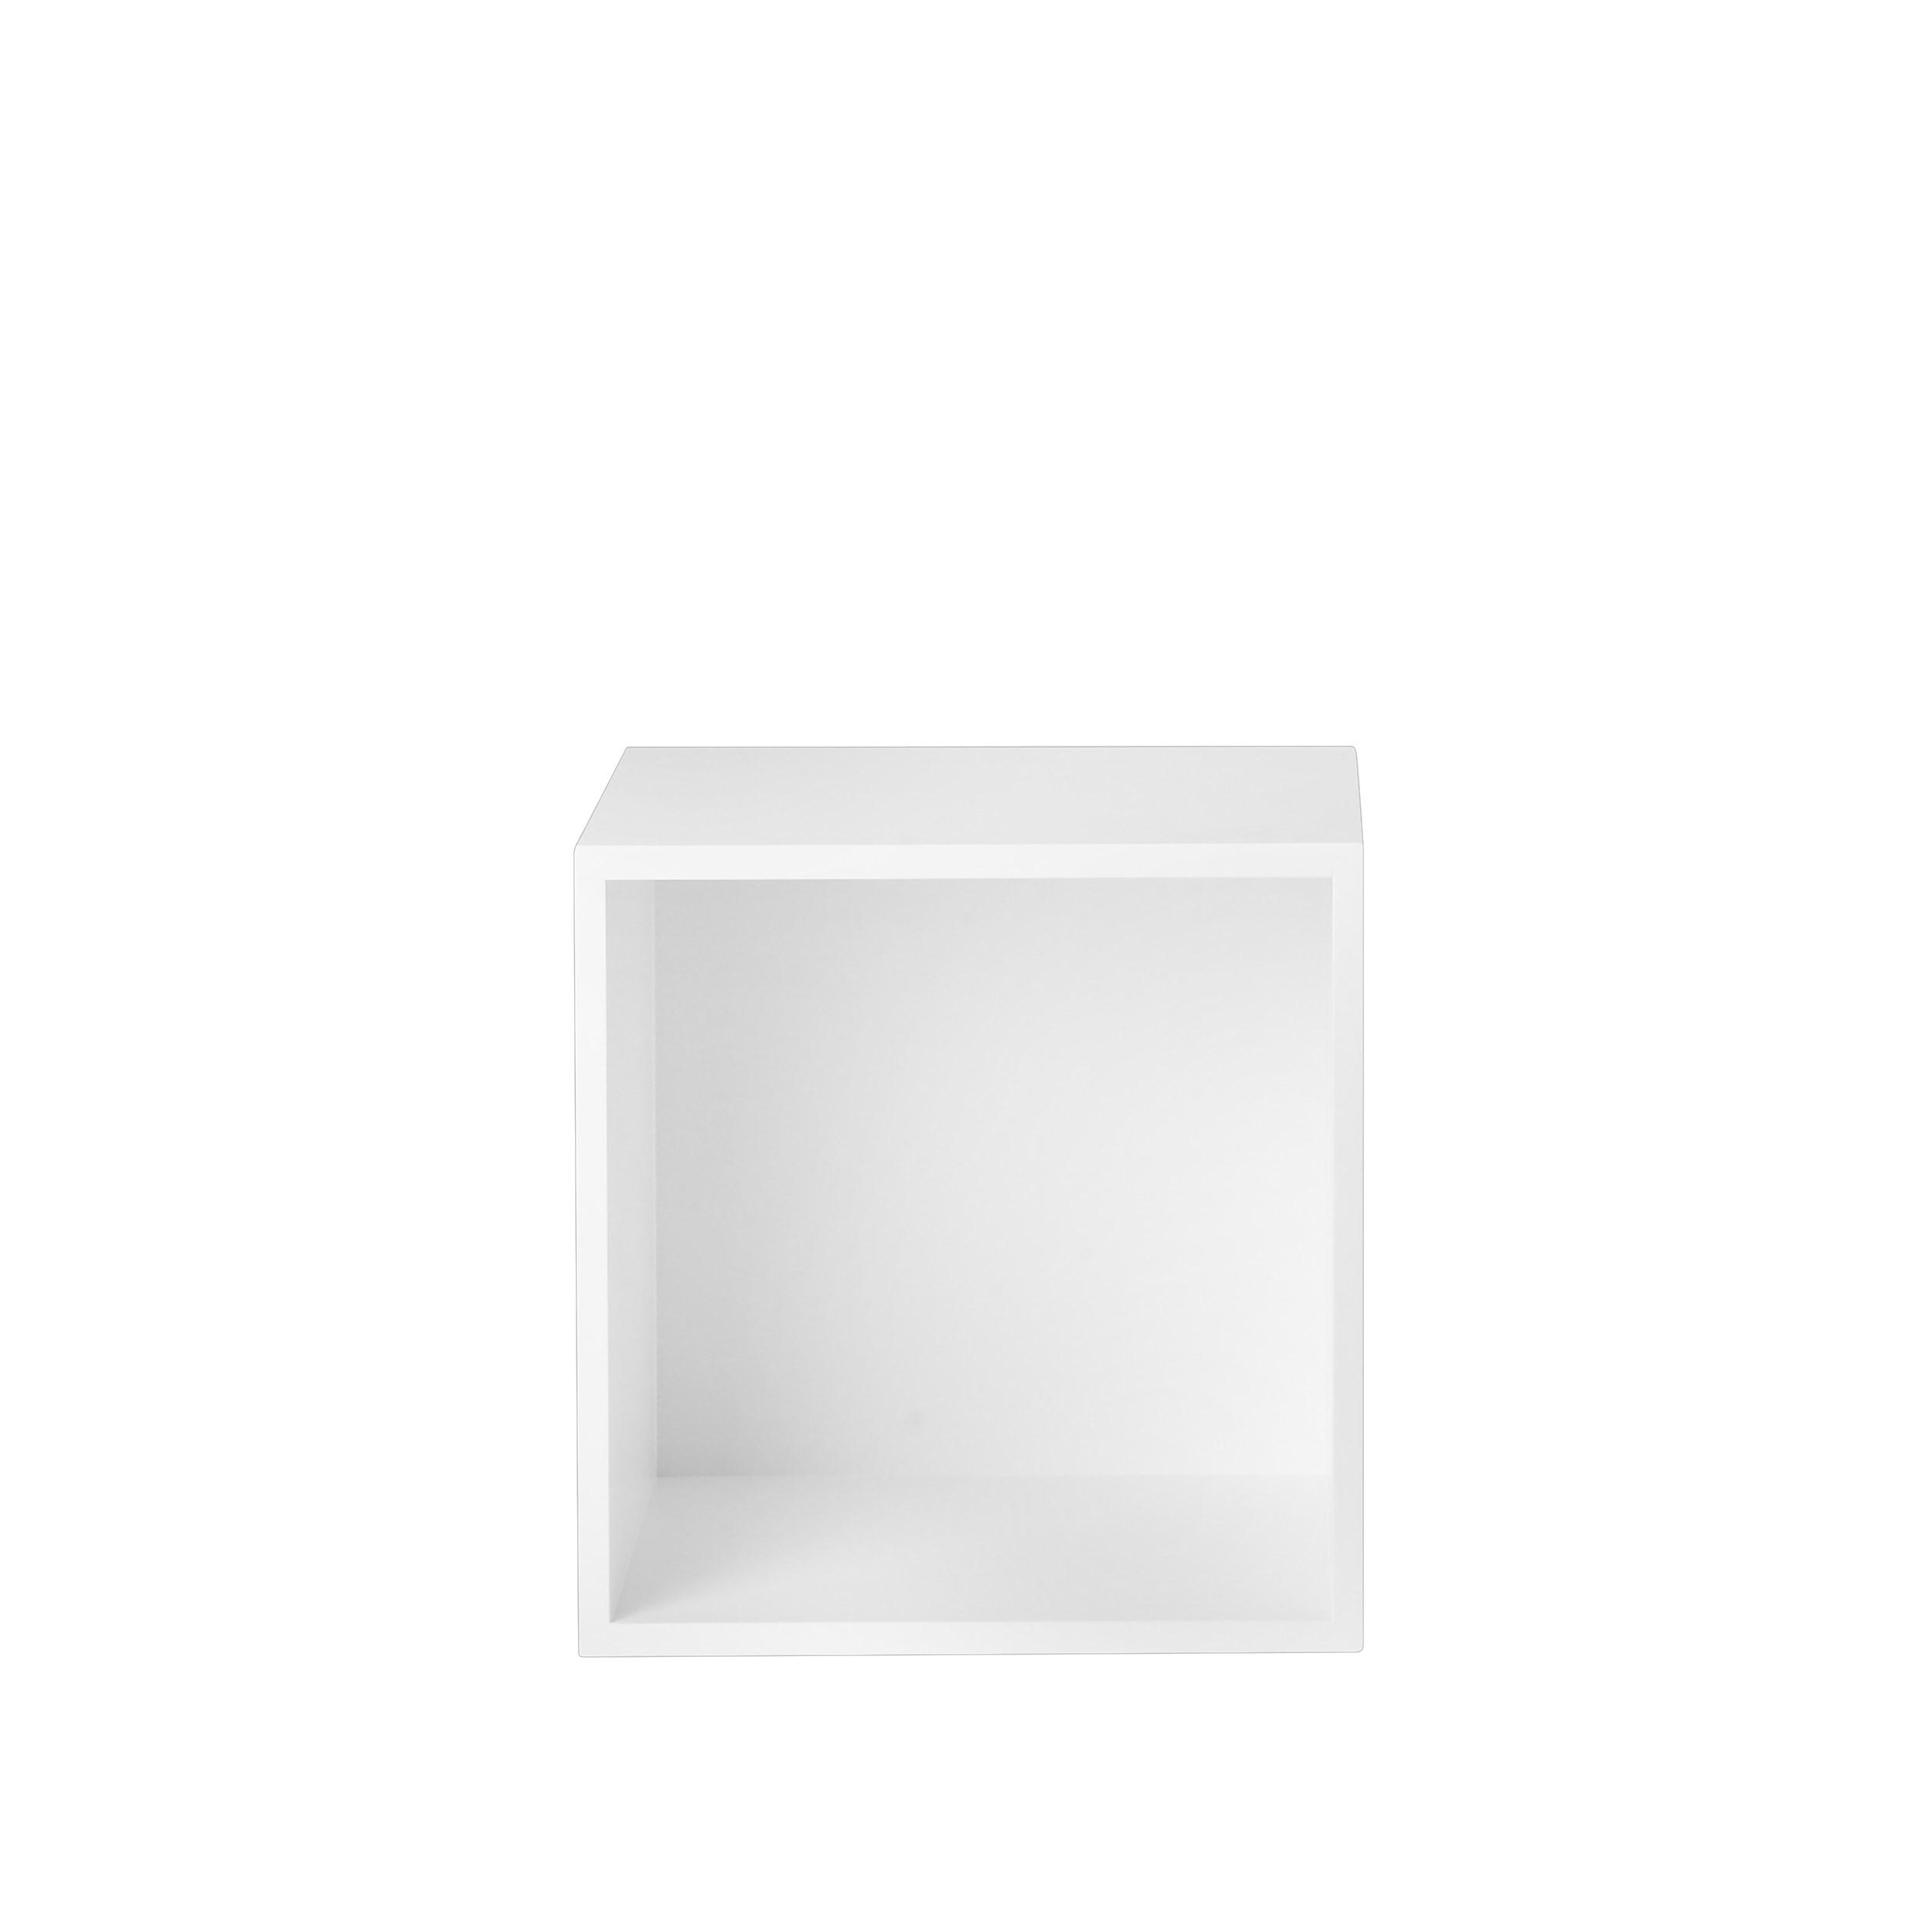 Stacked 2.0 medium backboard white